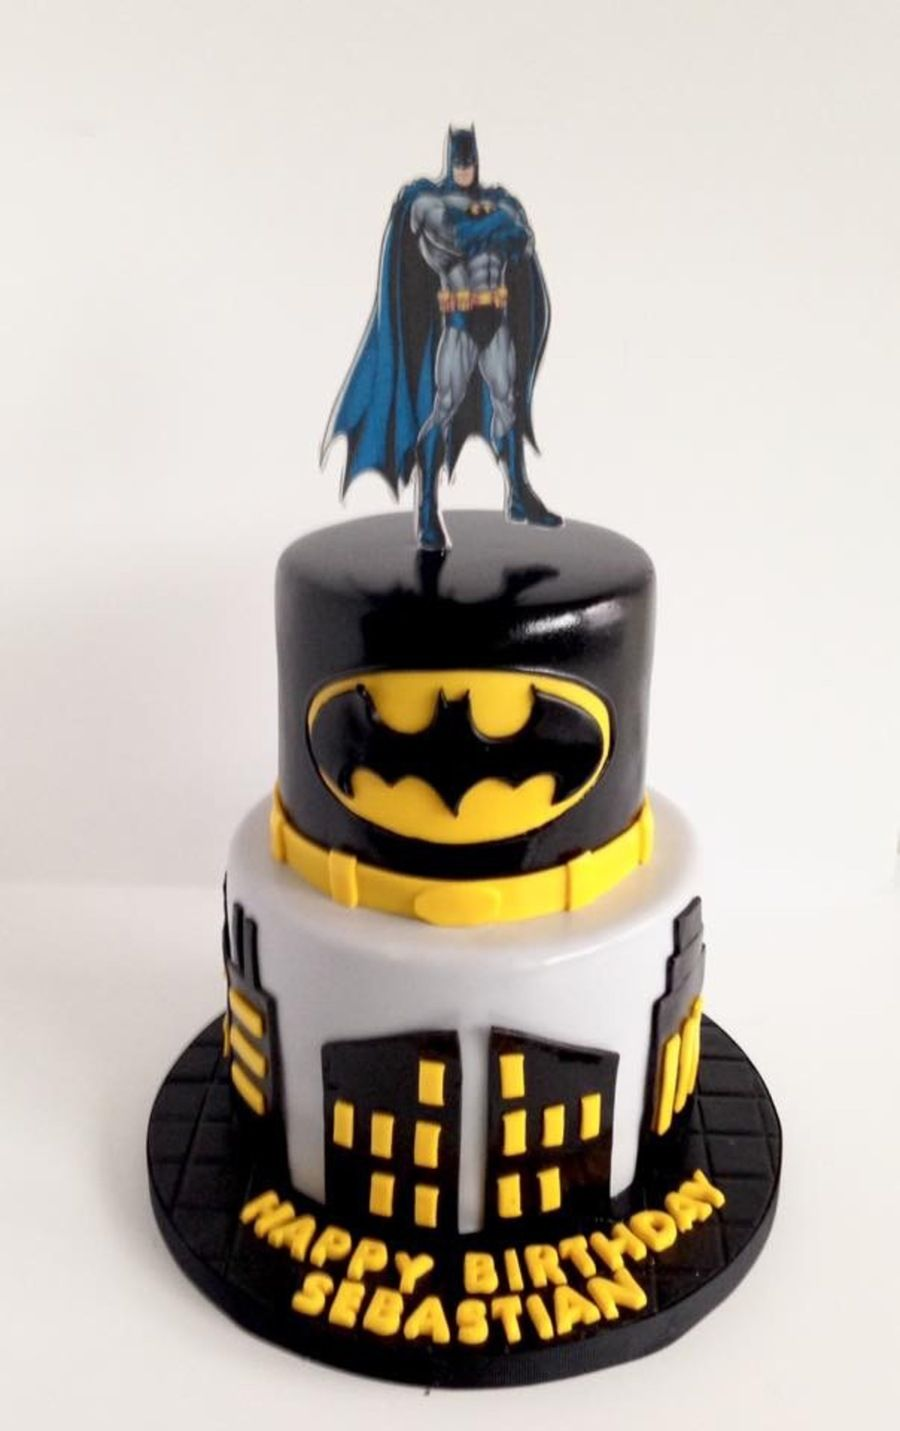 Amazing Batman With Images Batman Birthday Cakes Batman Cakes Funny Birthday Cards Online Bapapcheapnameinfo